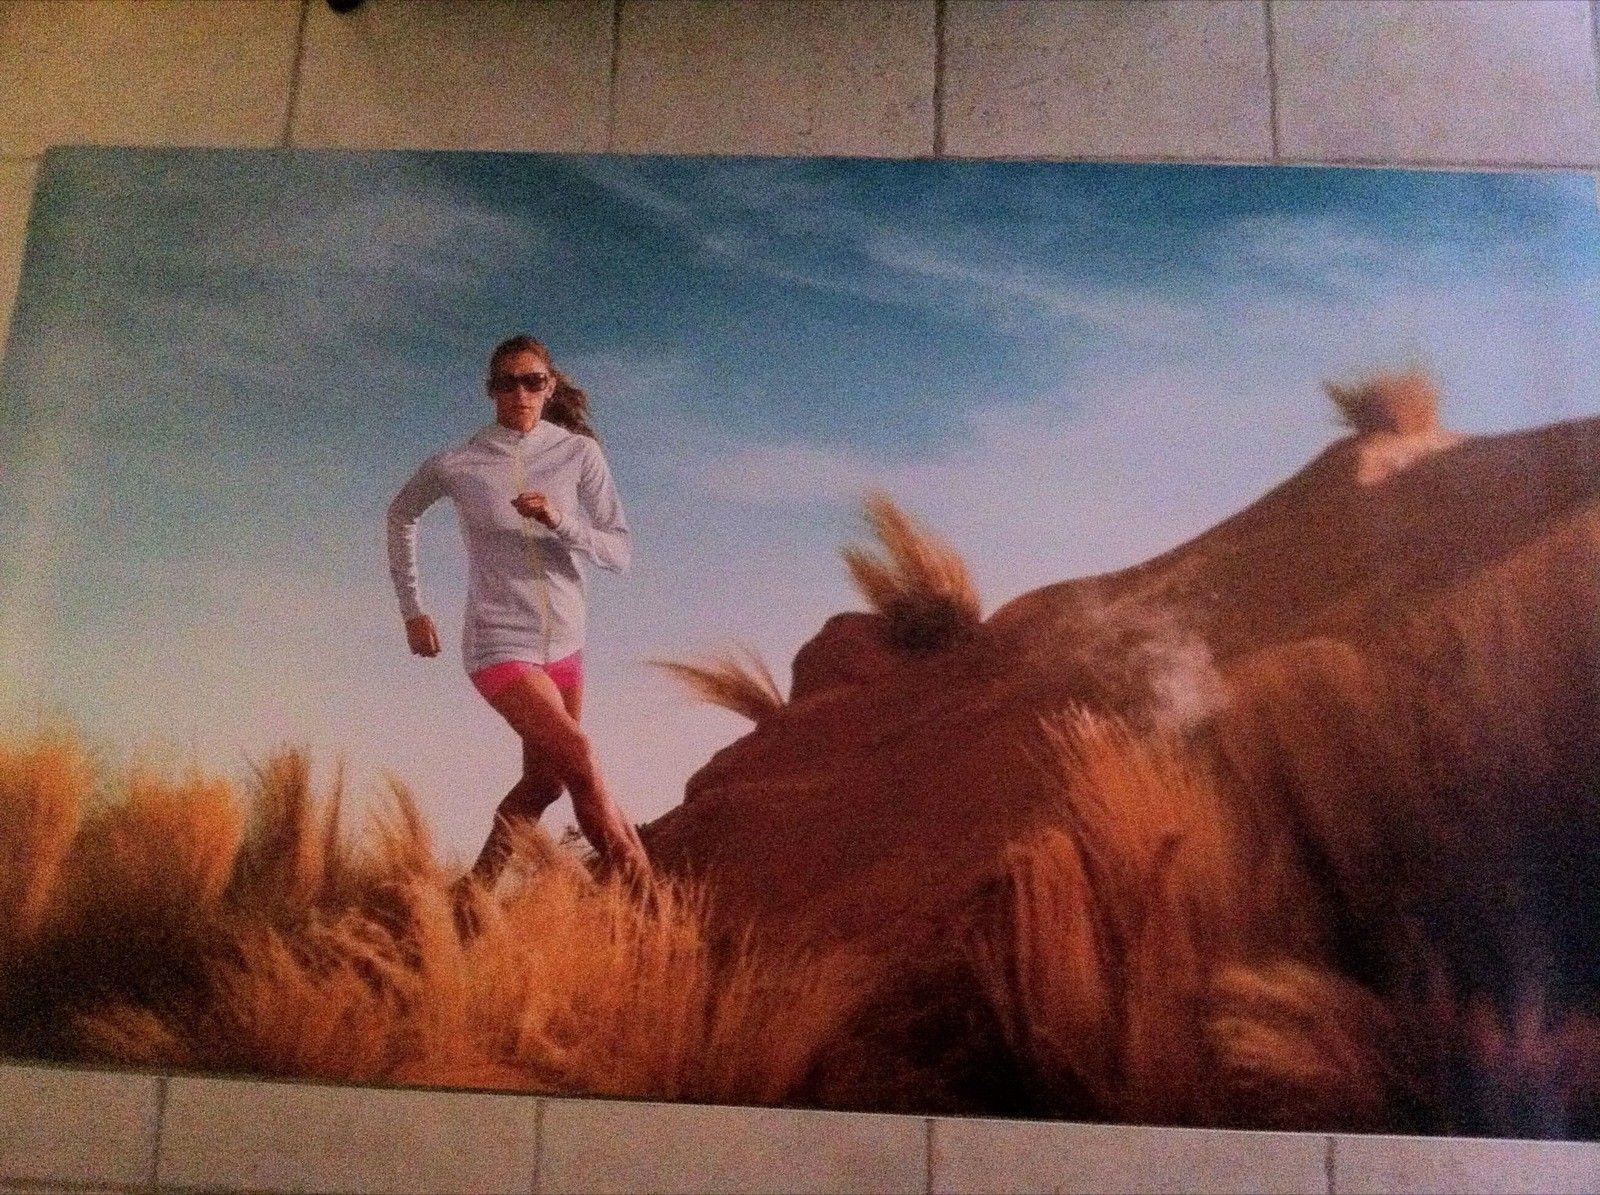 Oakley 4x7 Foot Magnetic Store Display Posters - IMG_1355.JPG